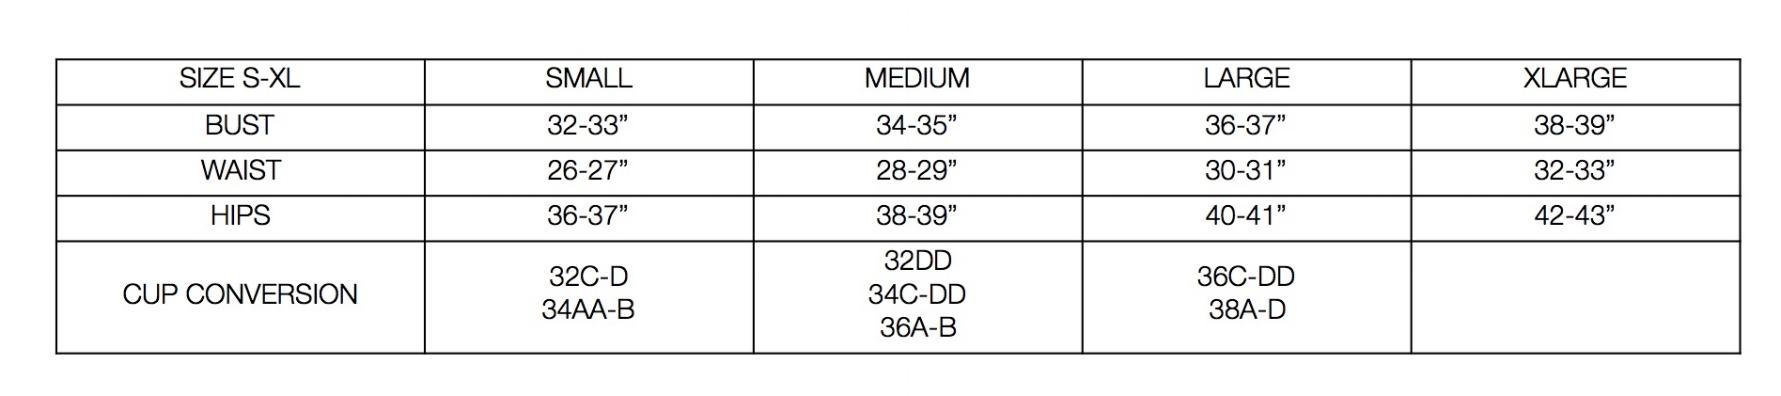 dominique-pearl-size-chart